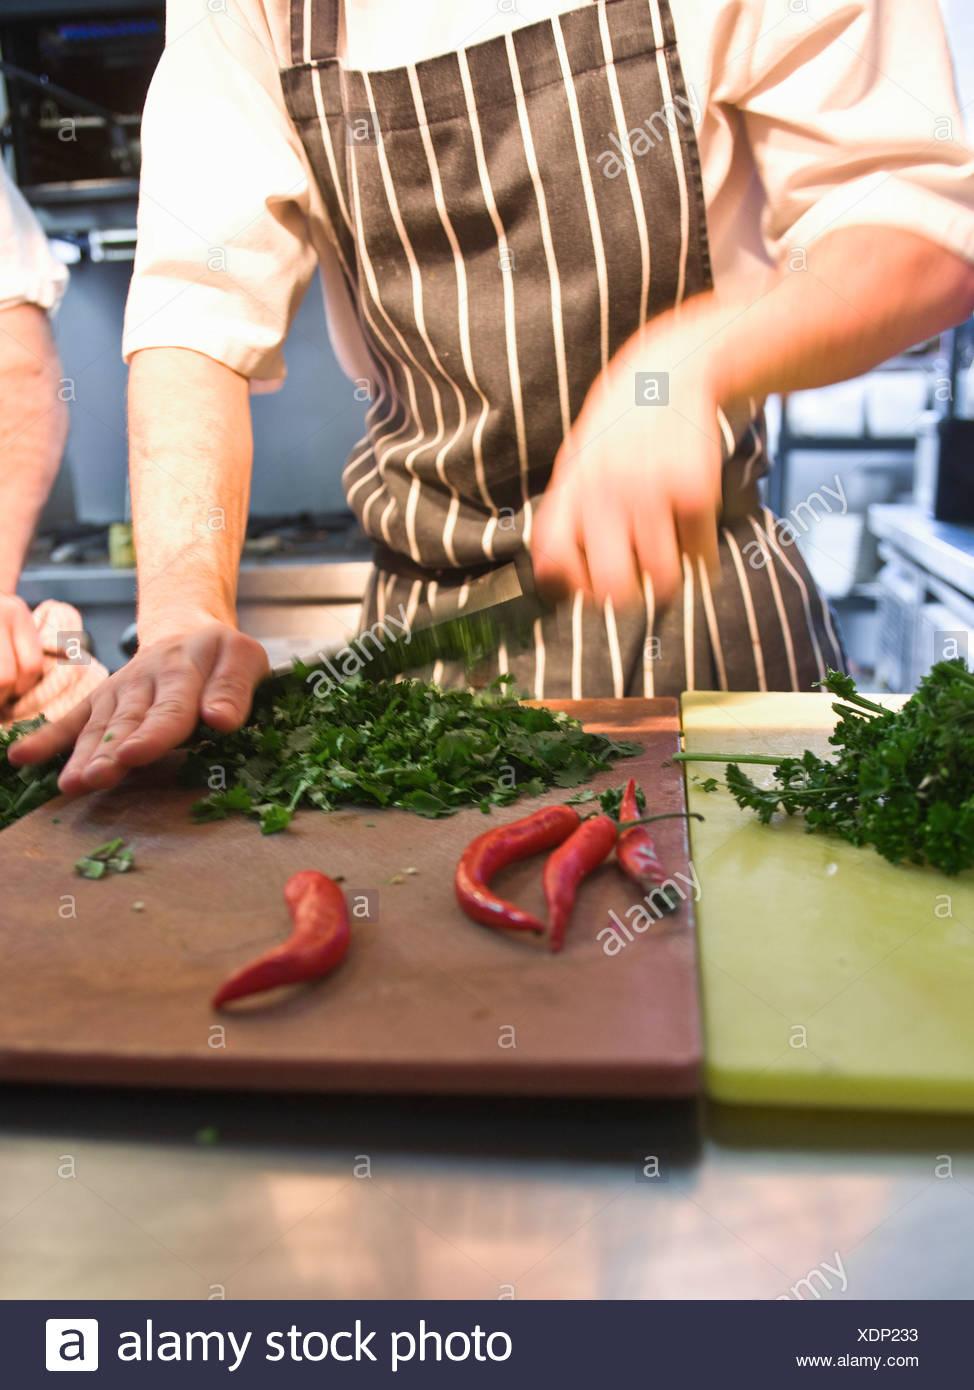 Chef chopping in restaurant kitchen Photo Stock